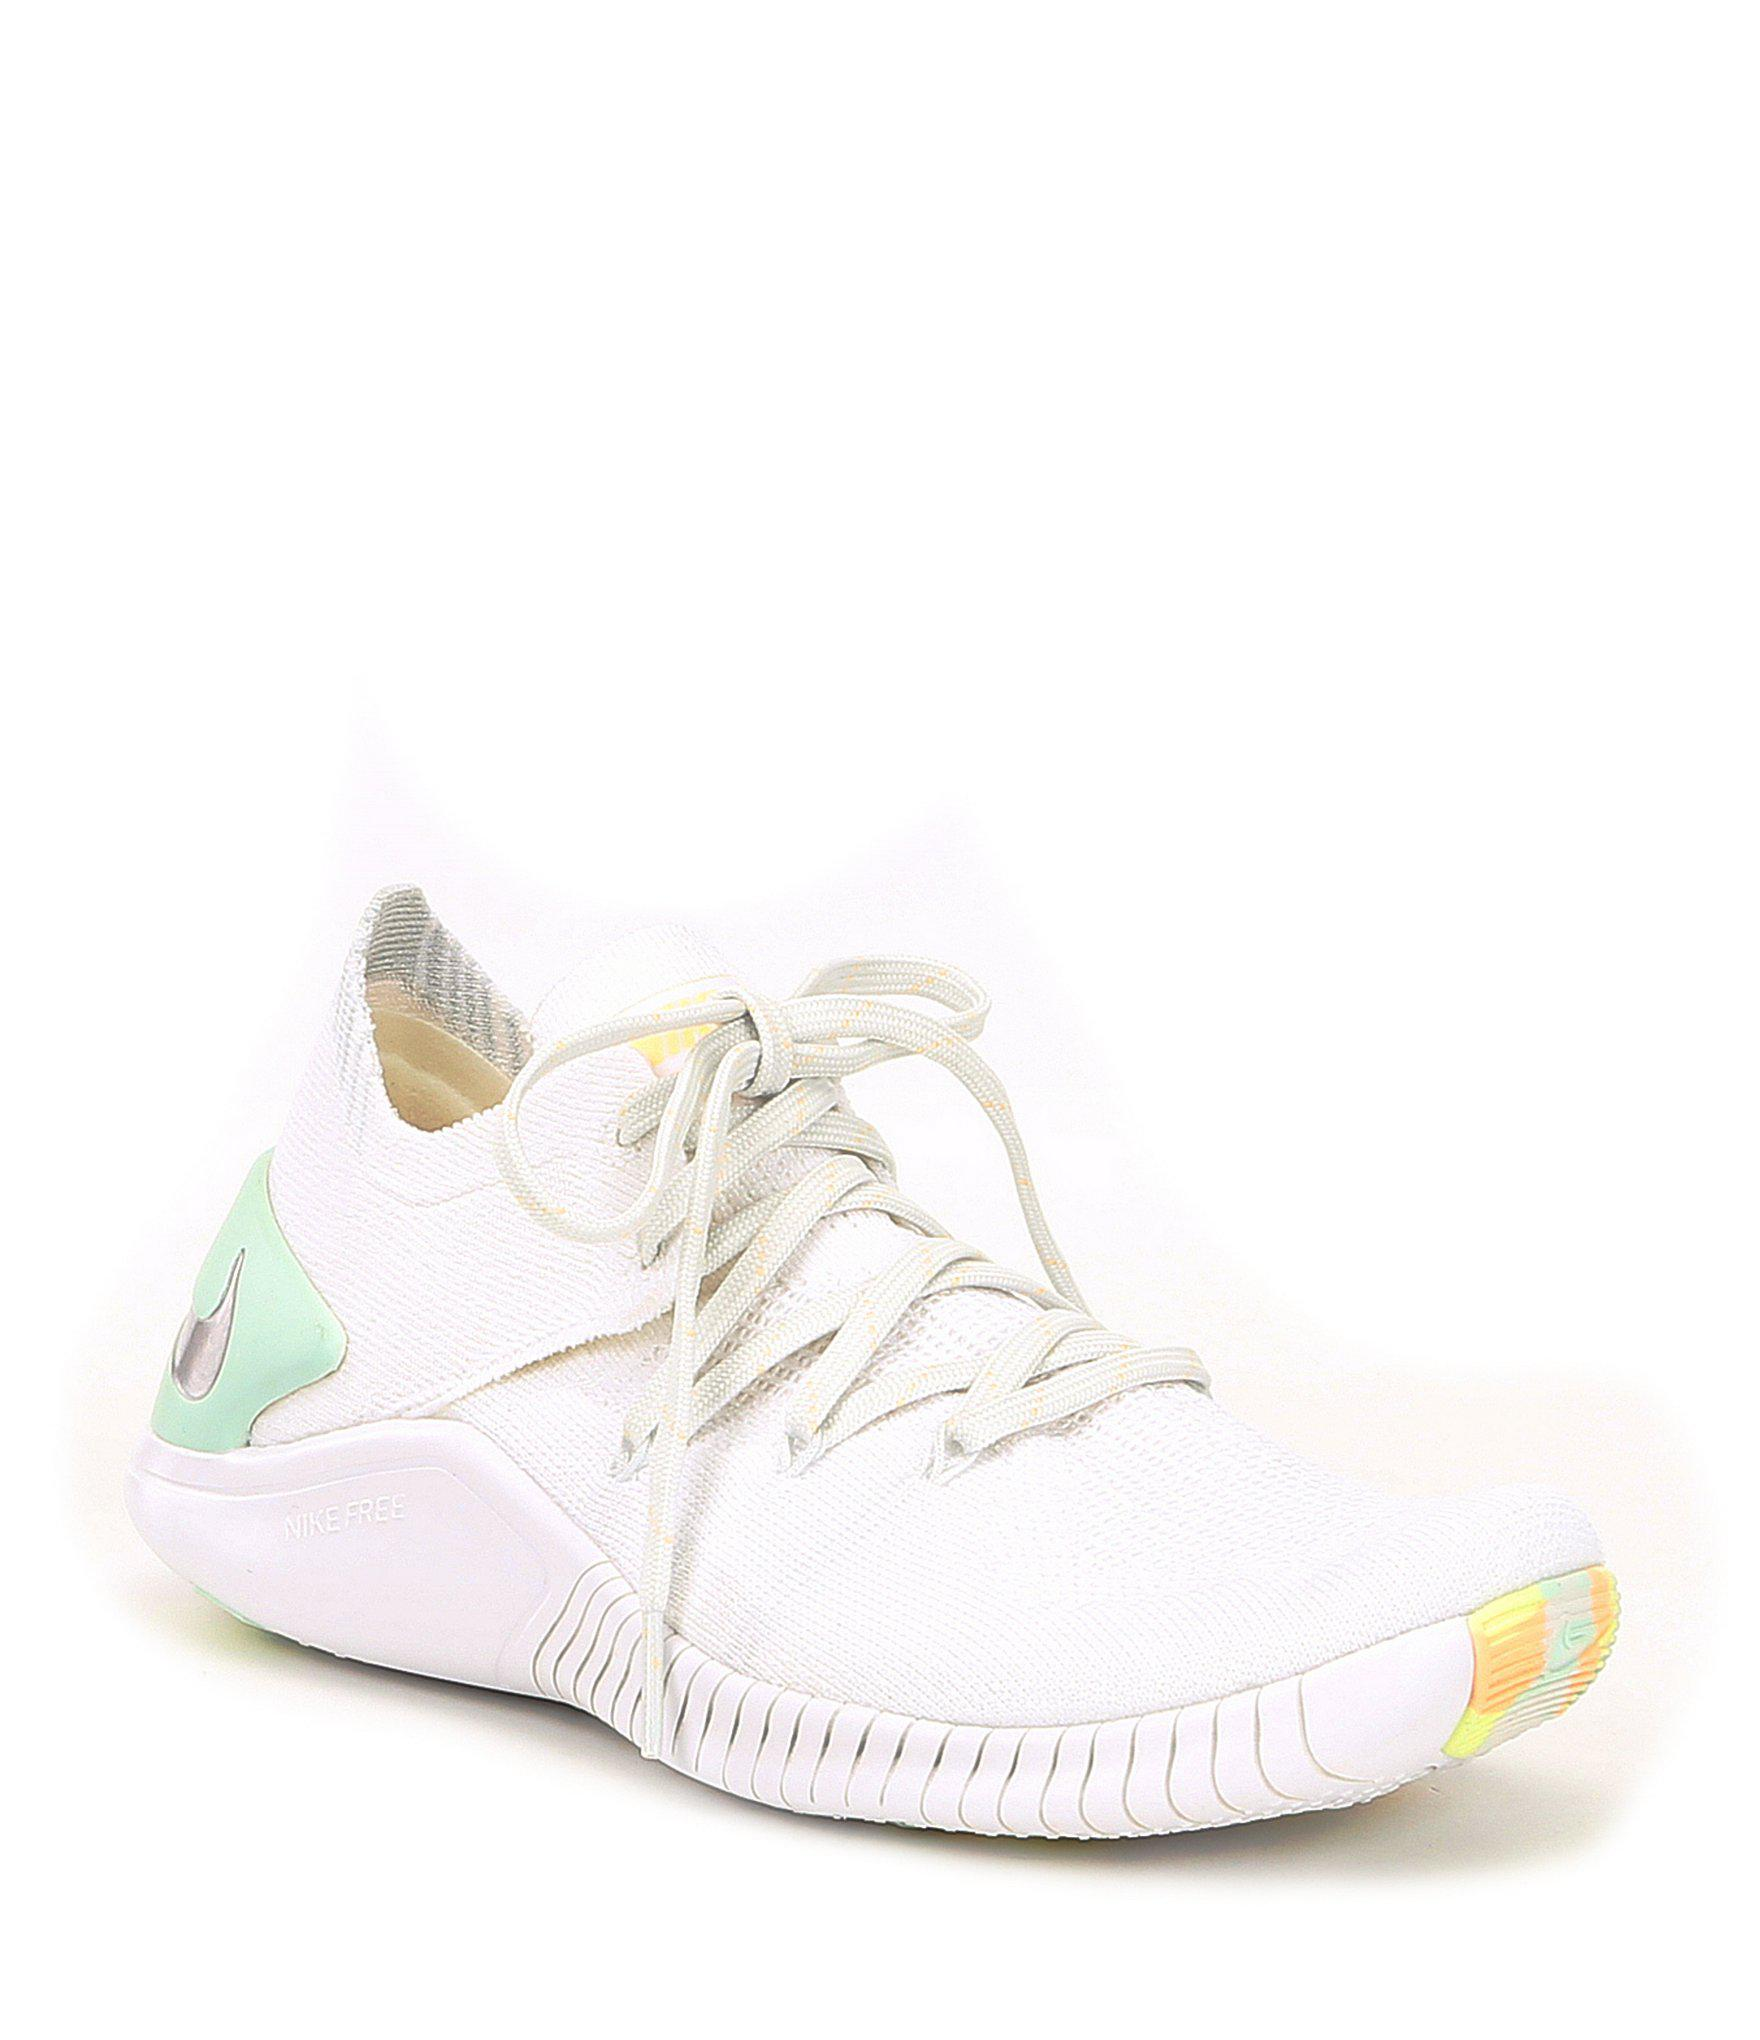 27fd61e46578 Lyst - Nike Women s Free Tr Flyknit 3 Rise Training Shoes in White